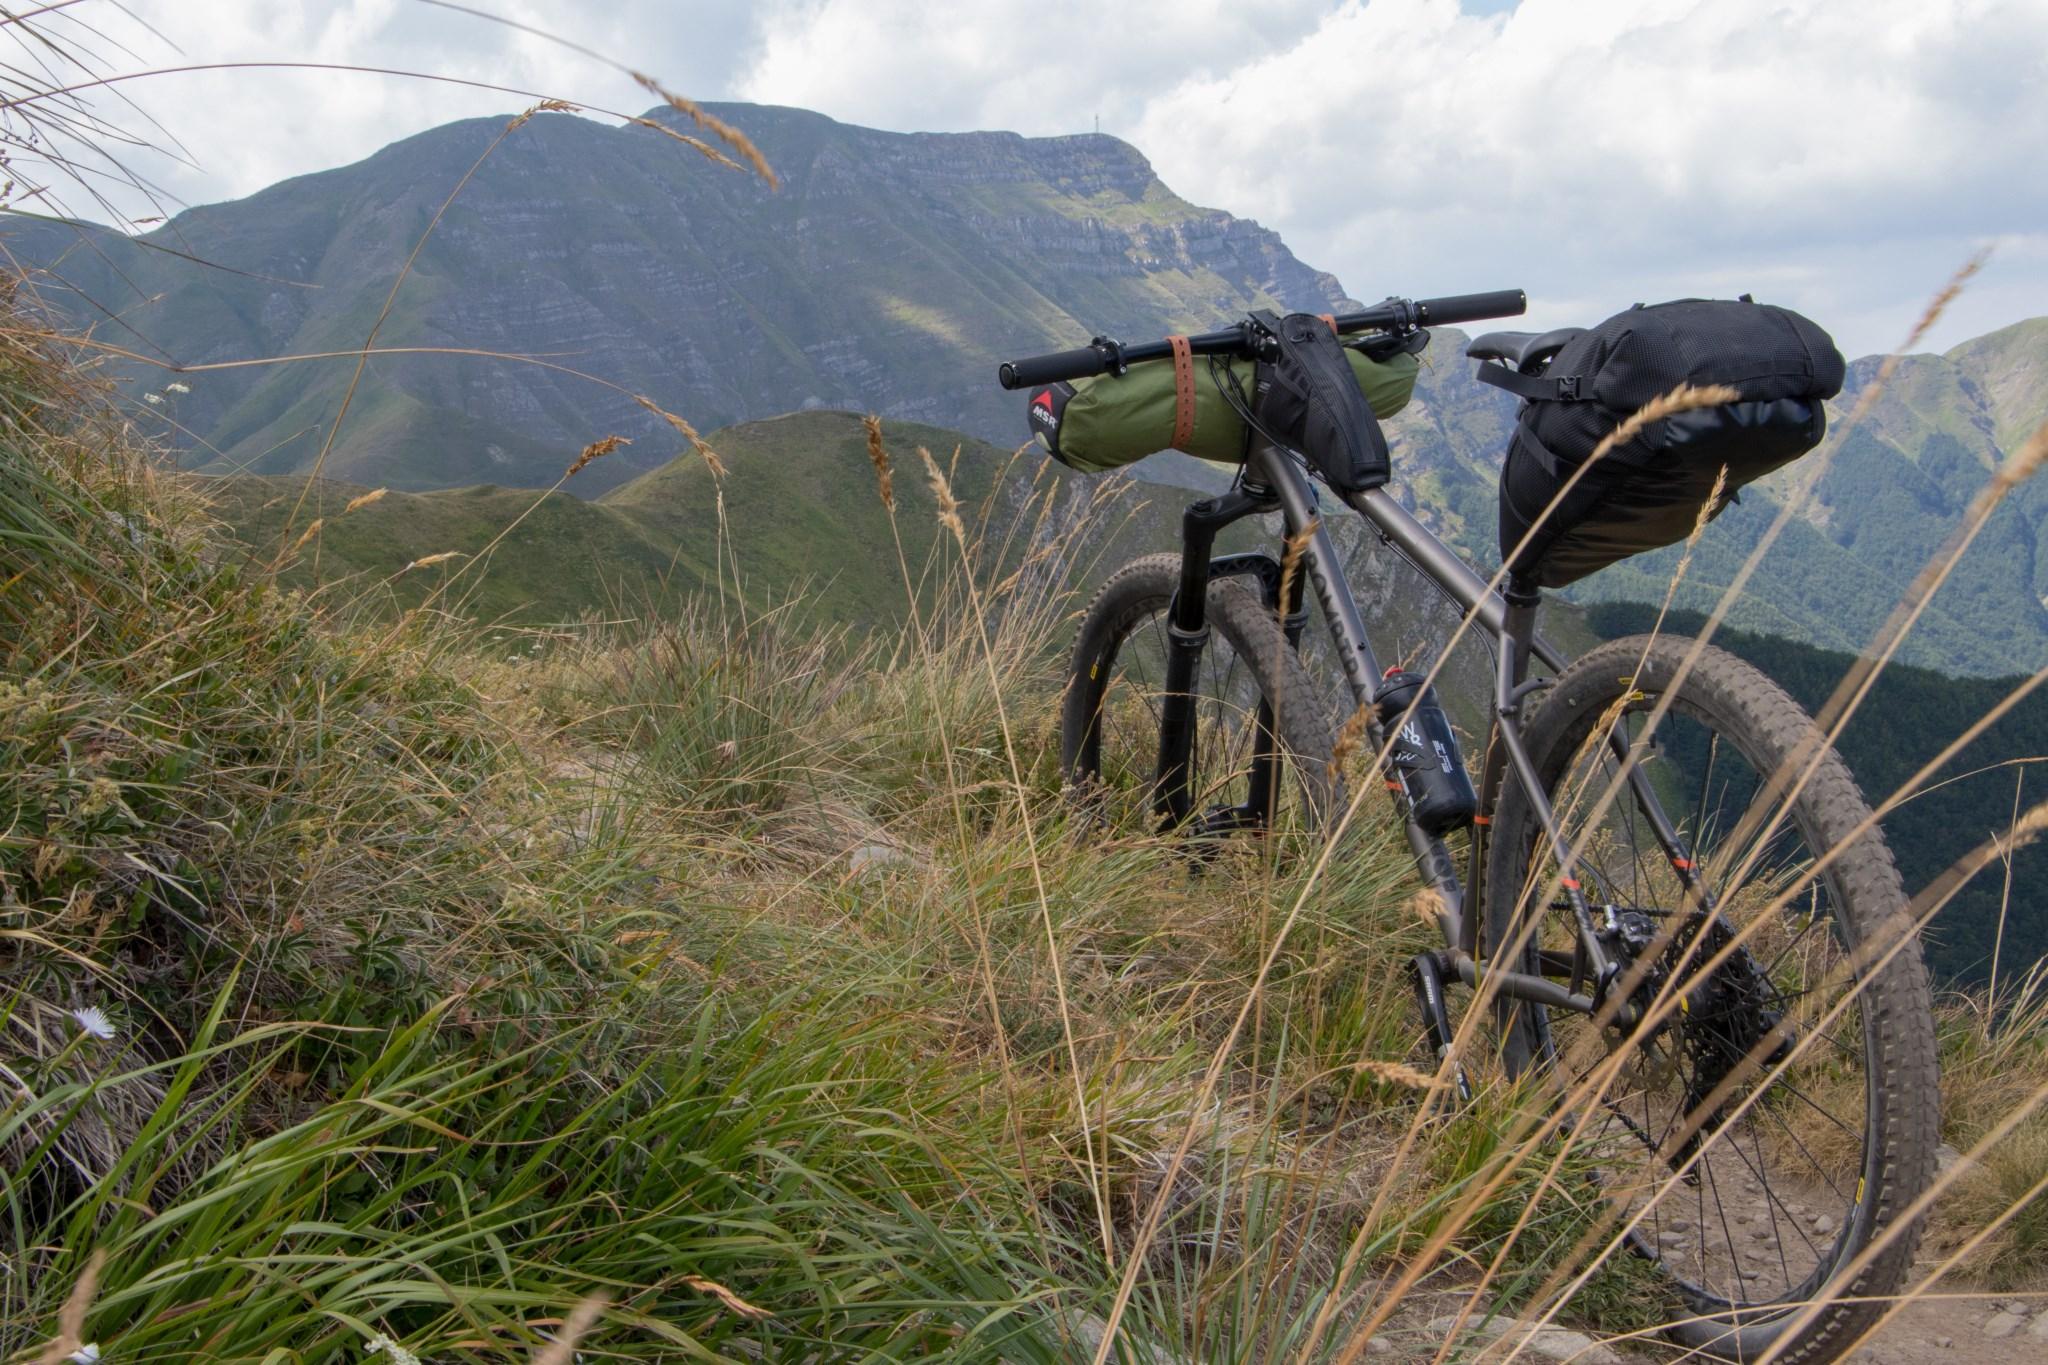 lago scaffaiolo overnight mtb bikepacking004